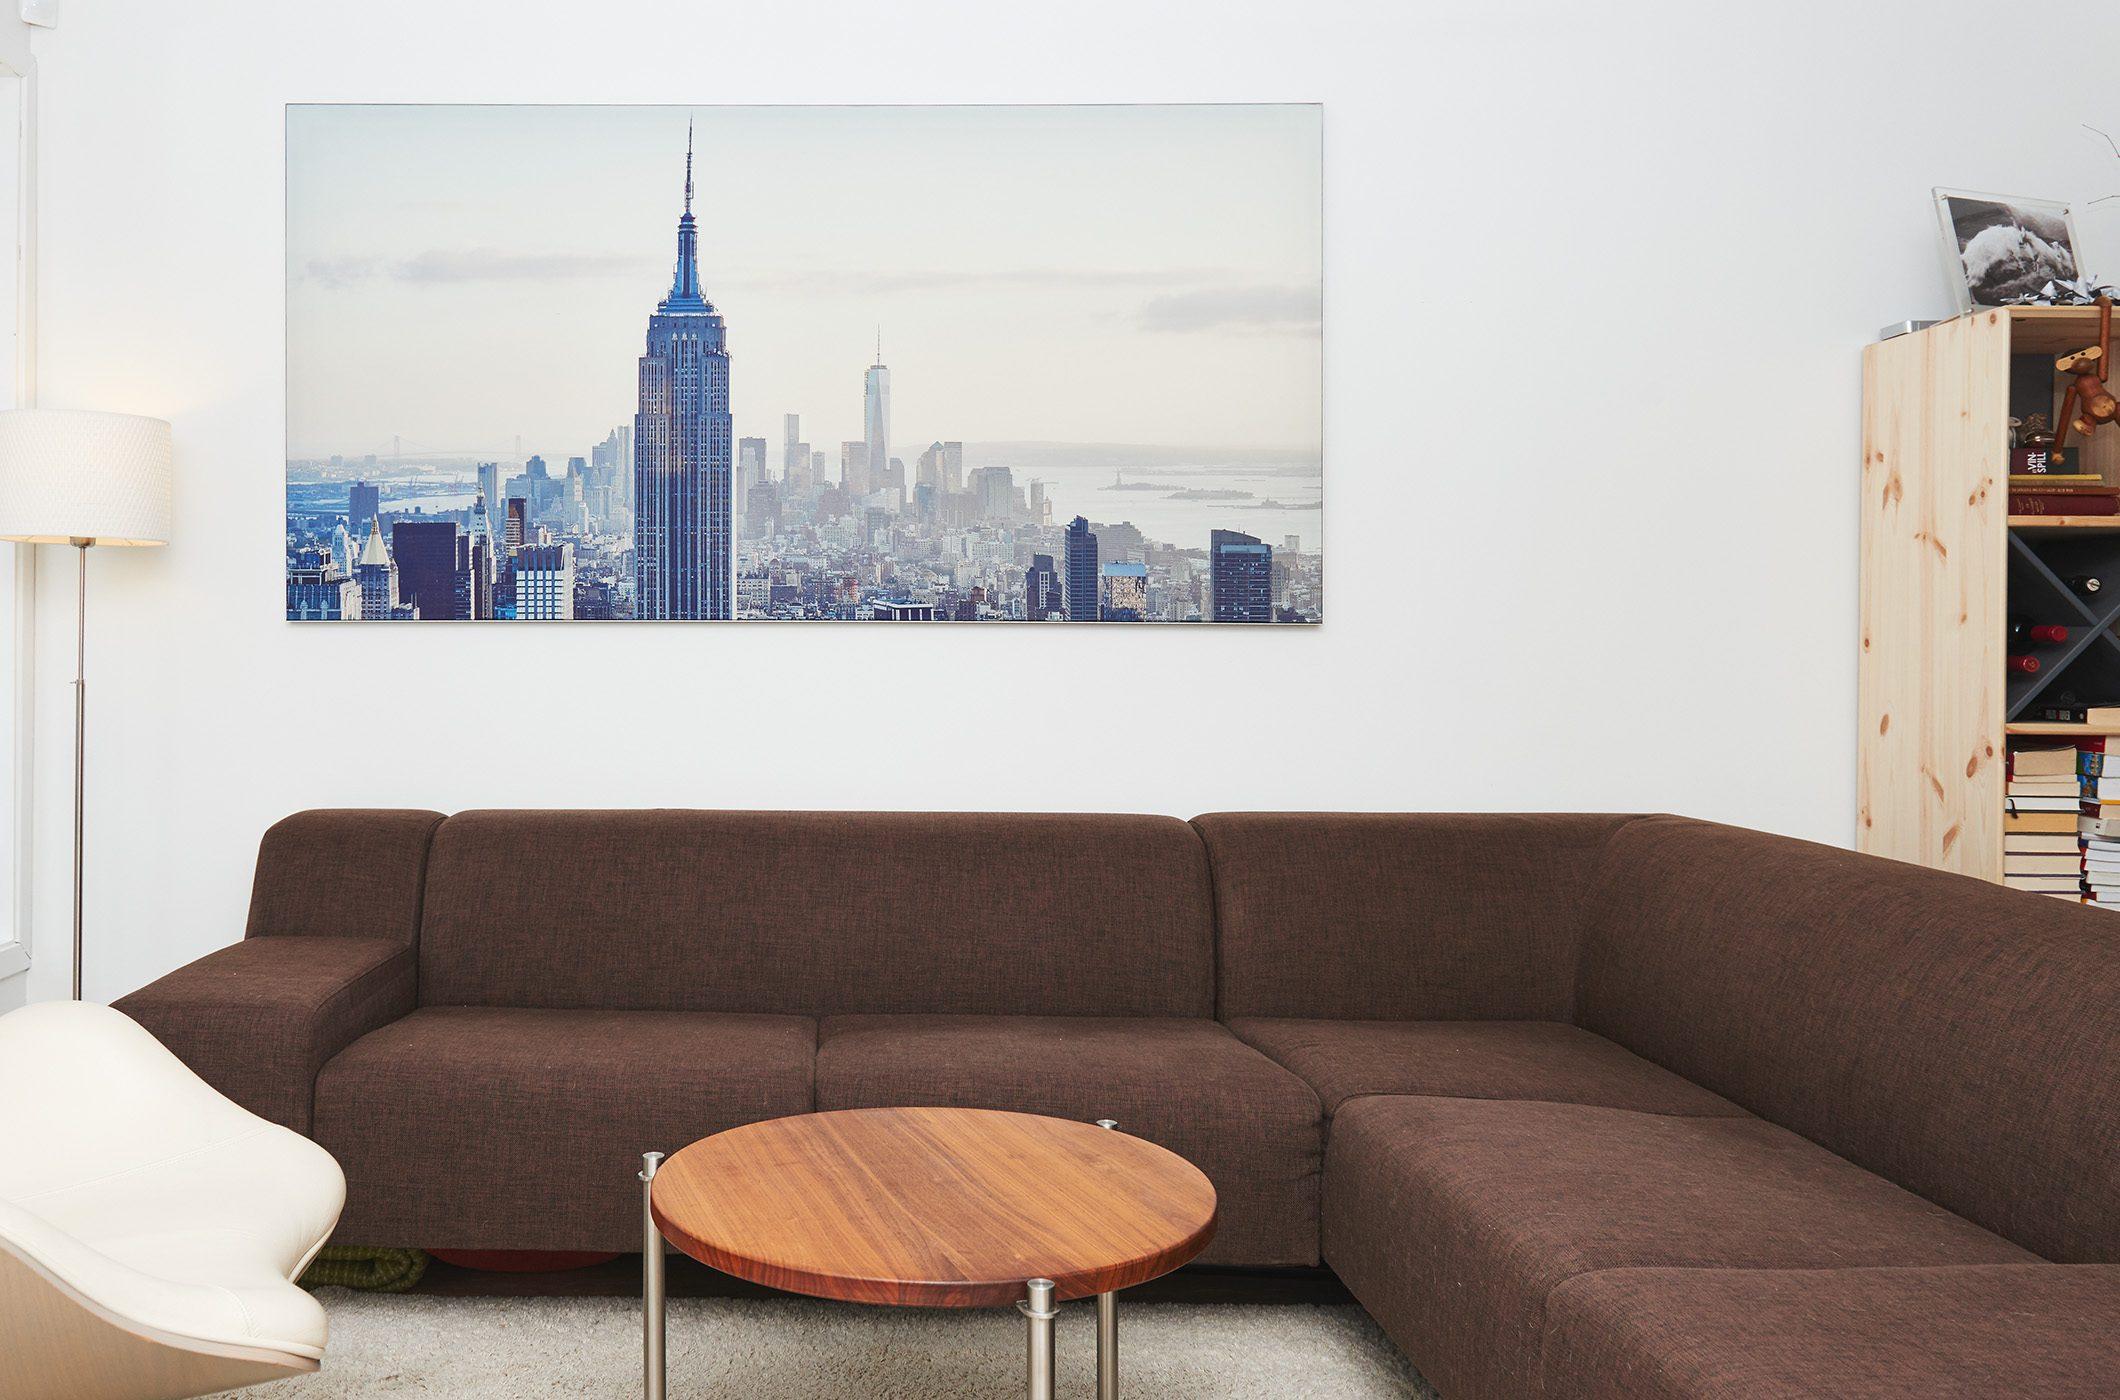 referansebilde-new-york-skyline-morning-glory